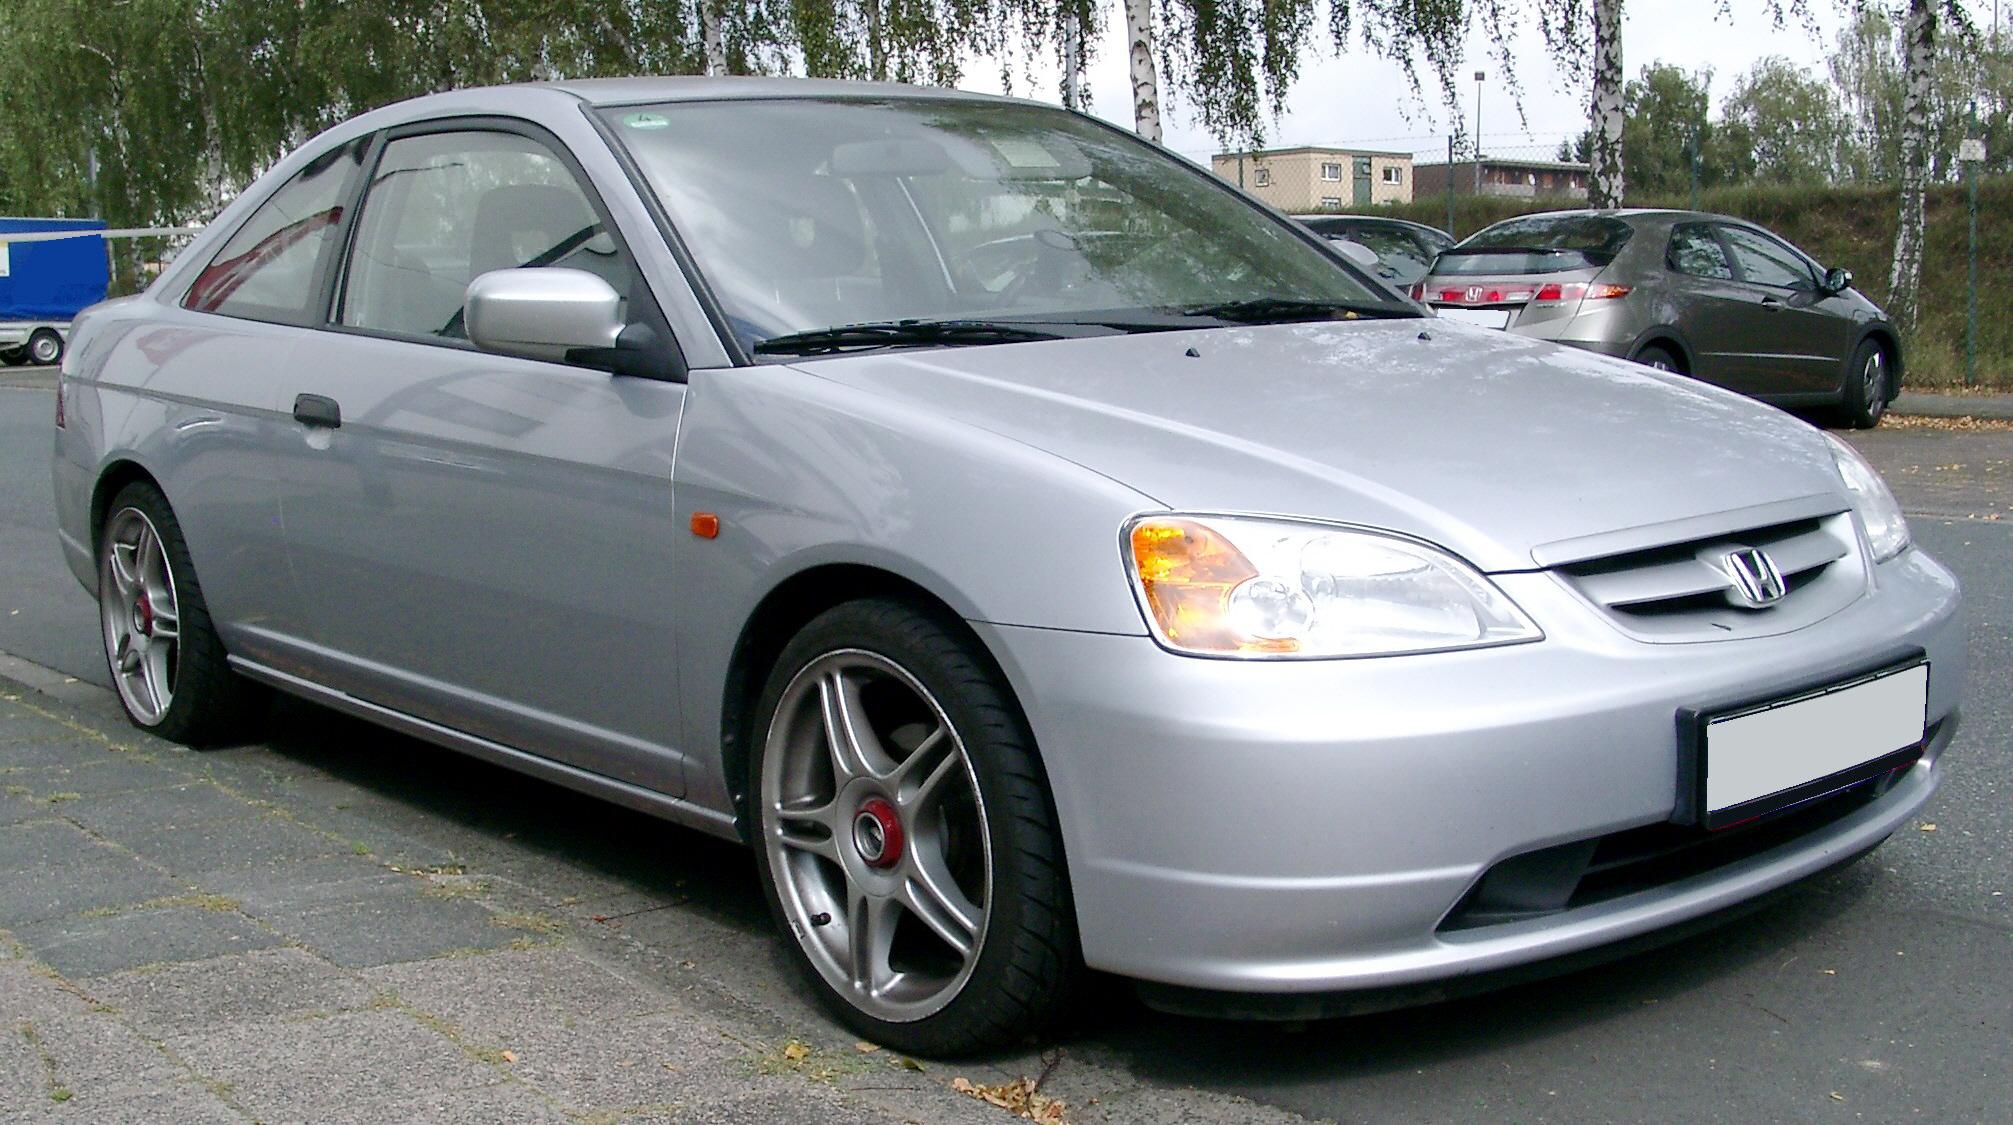 File:Honda Civic front 20070831.jpg - Wikimedia Commons